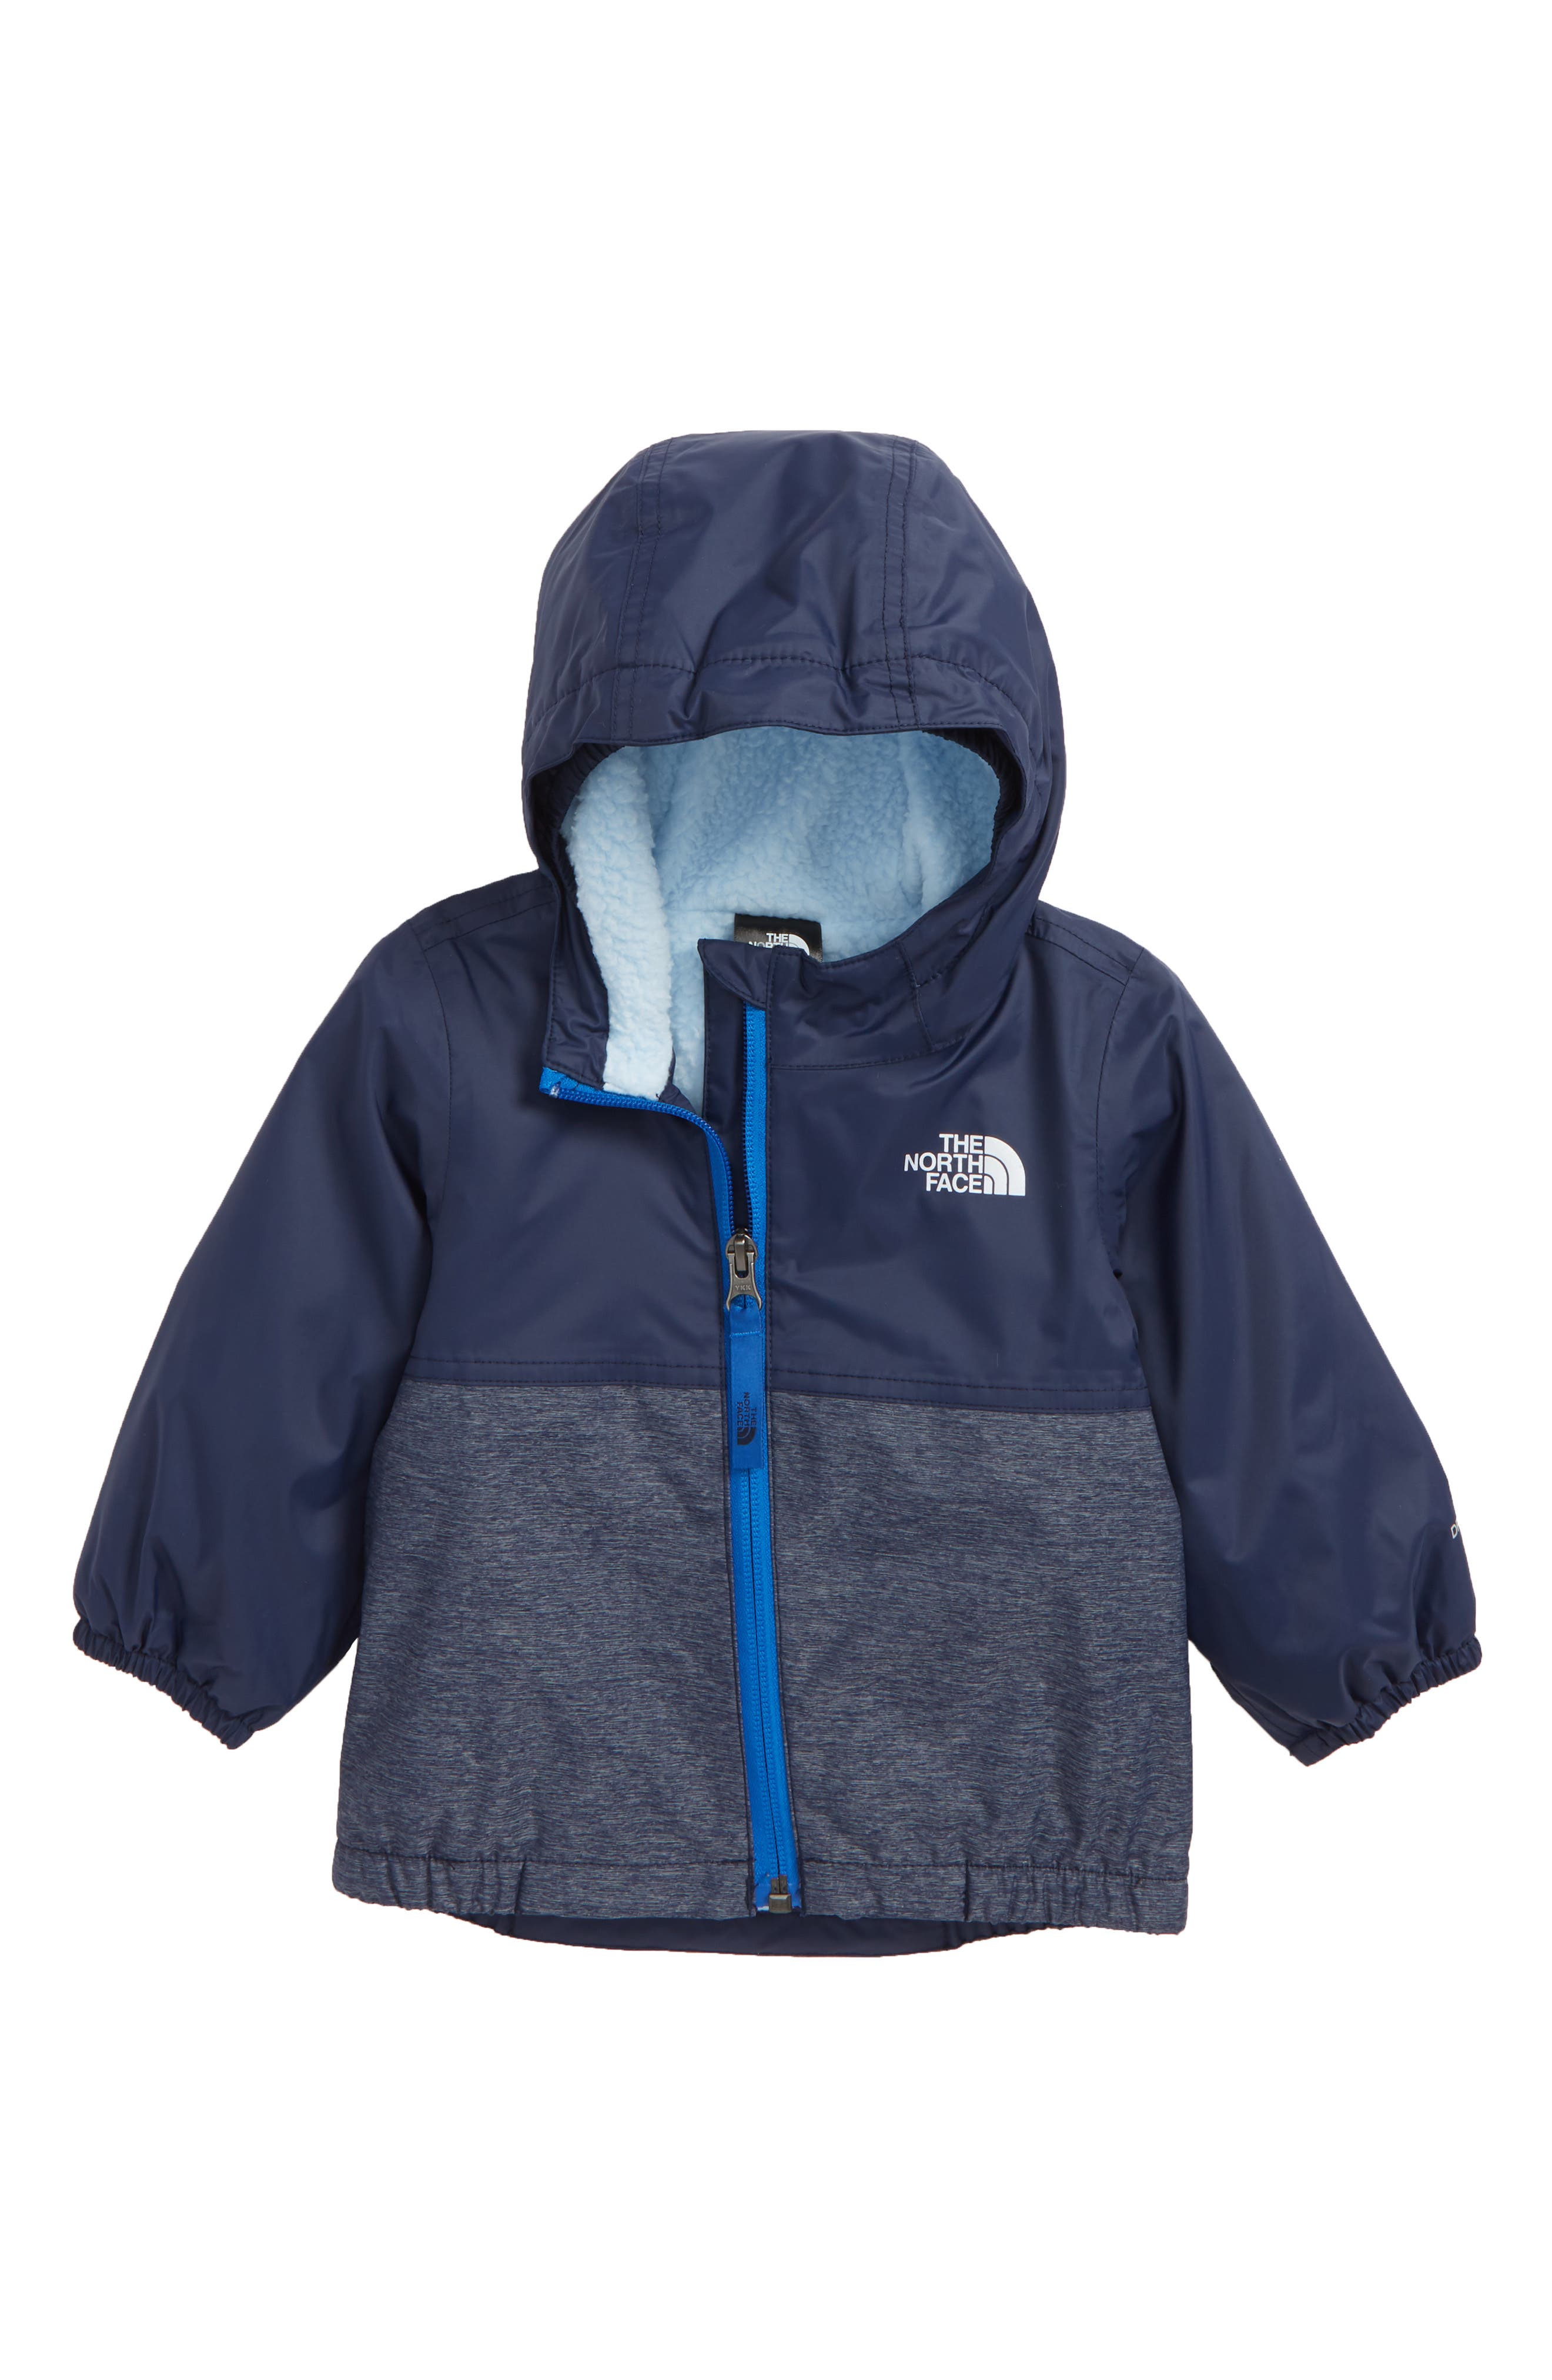 Warm Storm Hooded Waterproof Jacket,                             Main thumbnail 1, color,                             COSMIC BLUE/ BLUE HEATHER